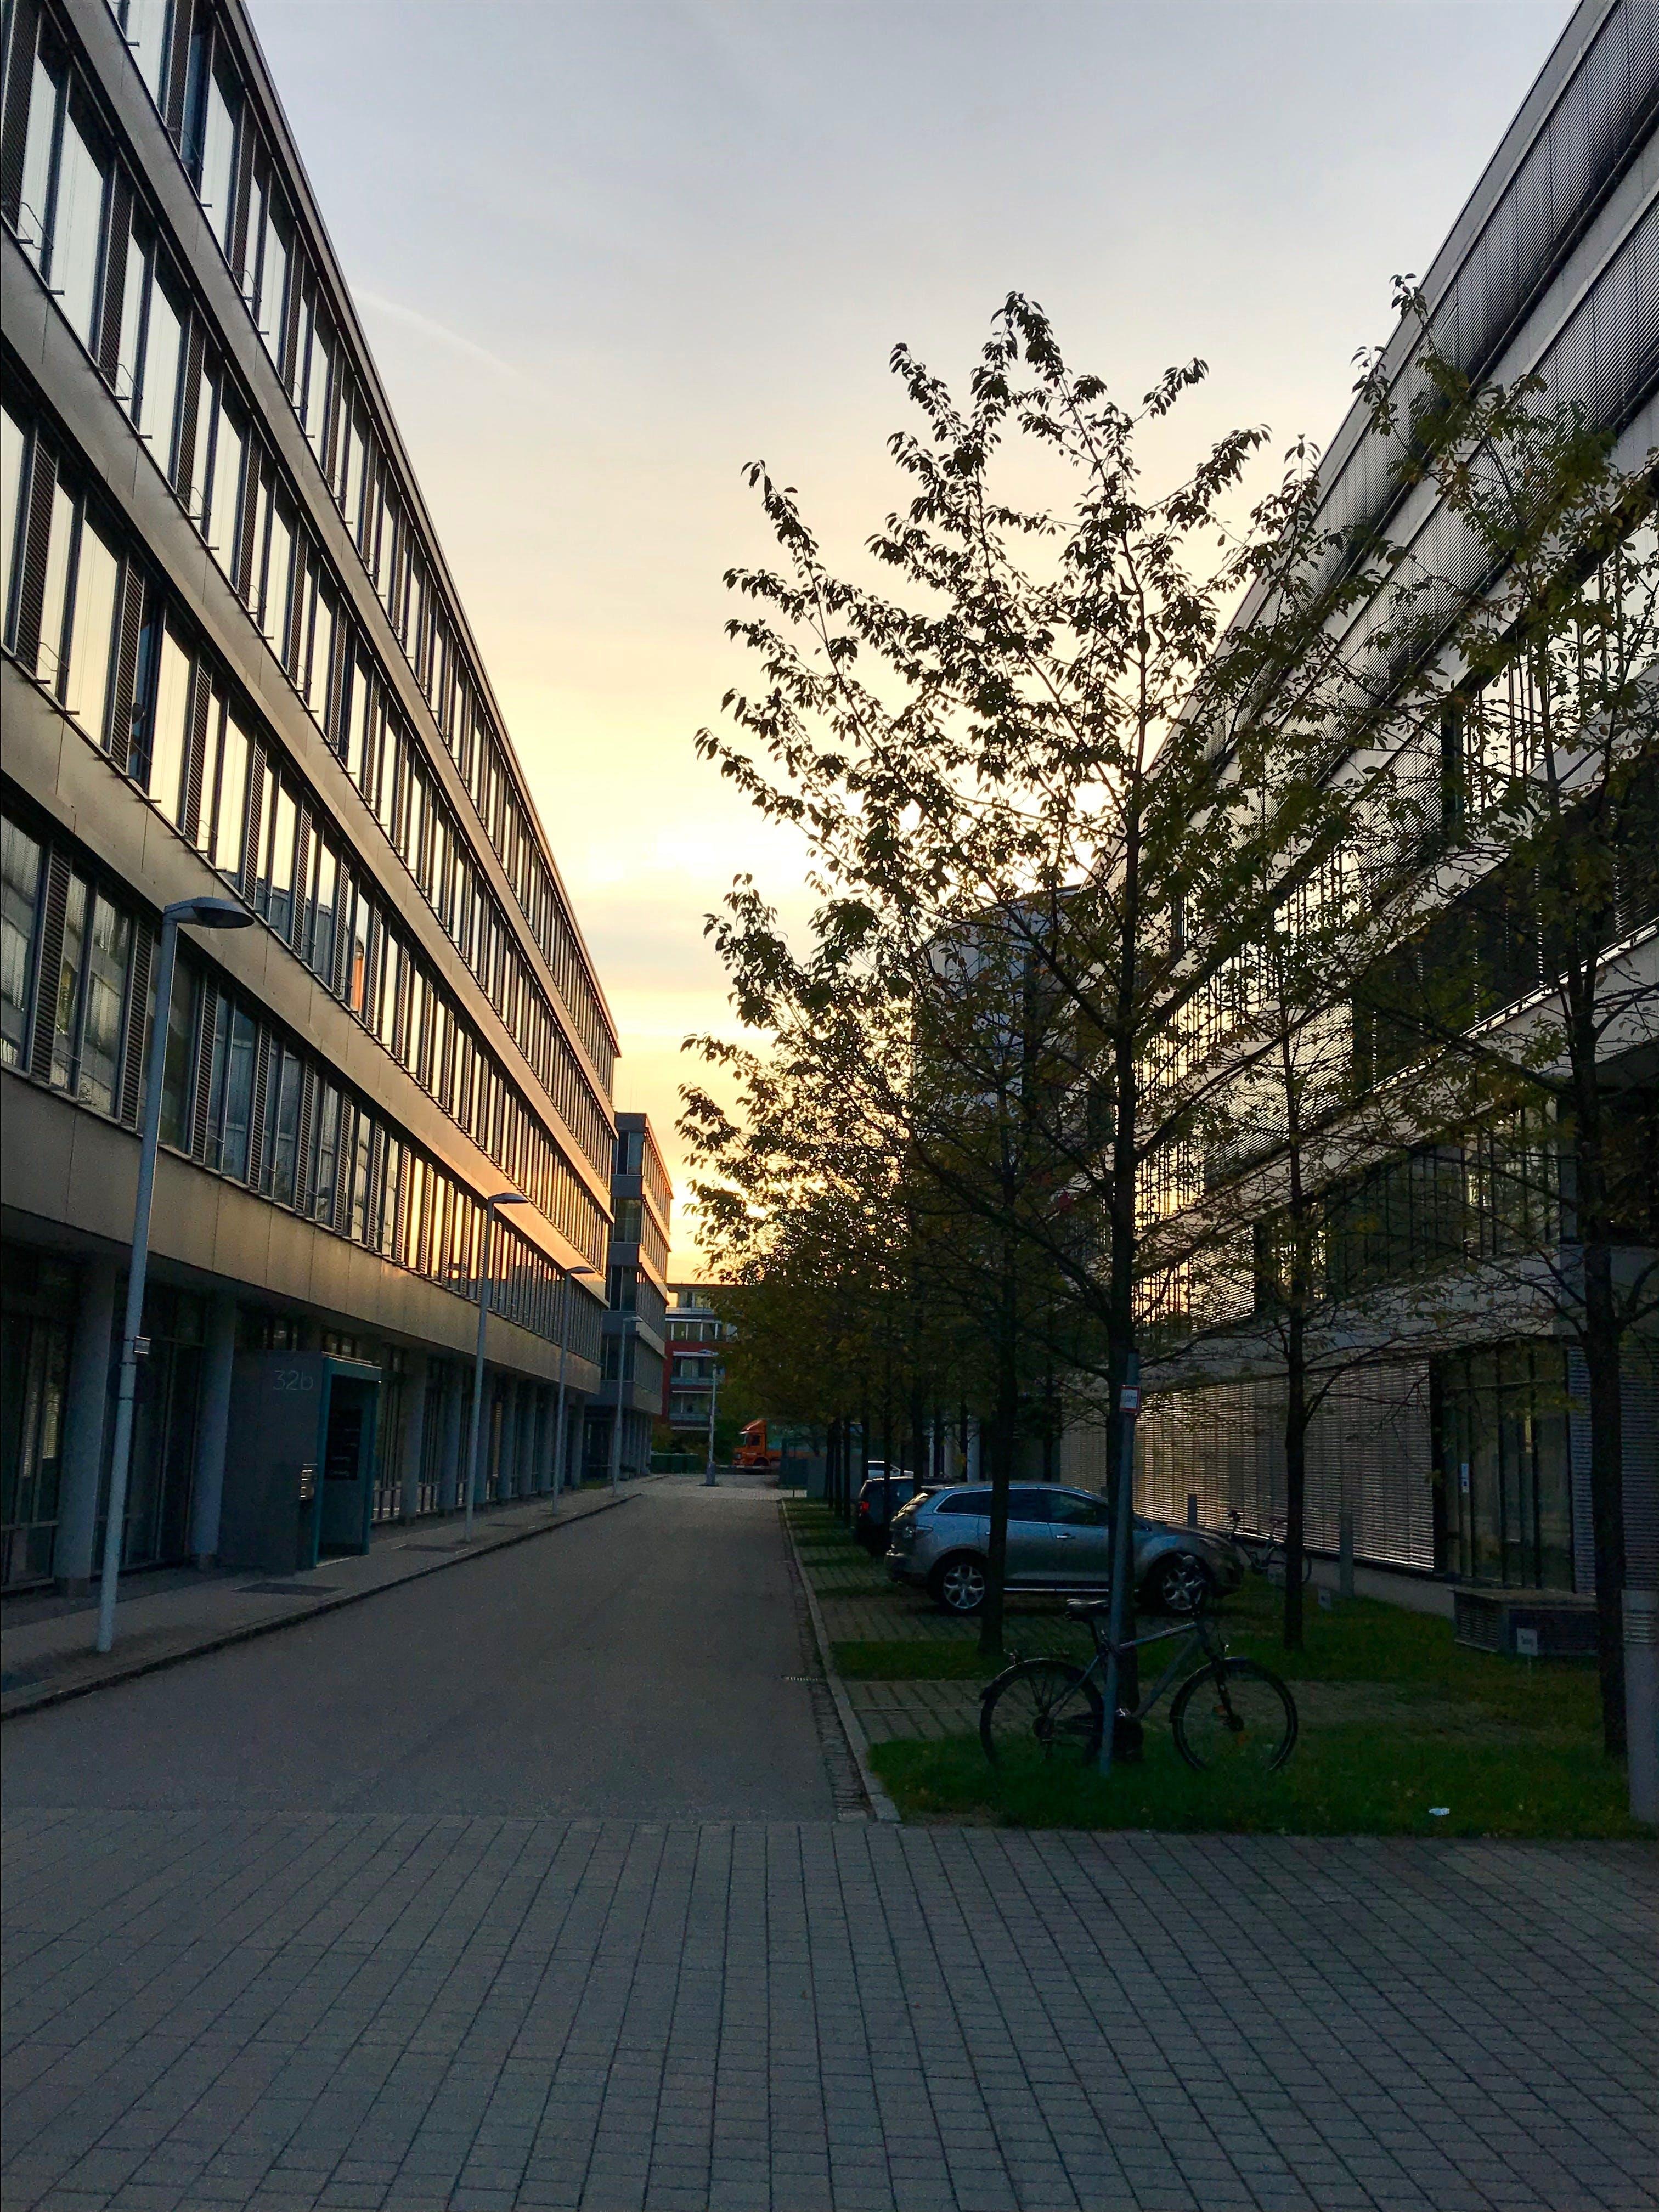 Free stock photo of street, building, sunrise, light reflections